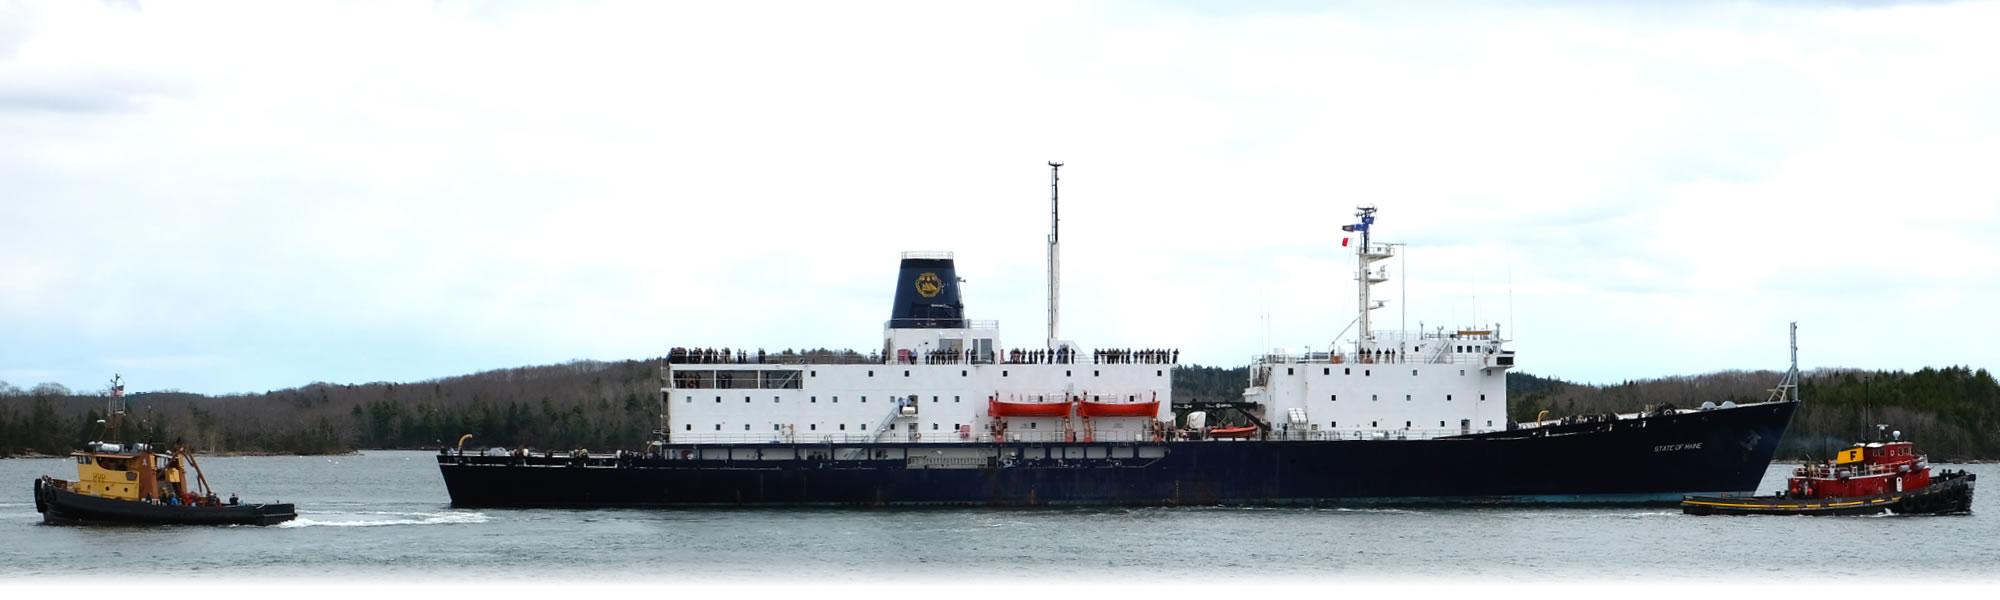 TSSOM Summer Cruise Departure